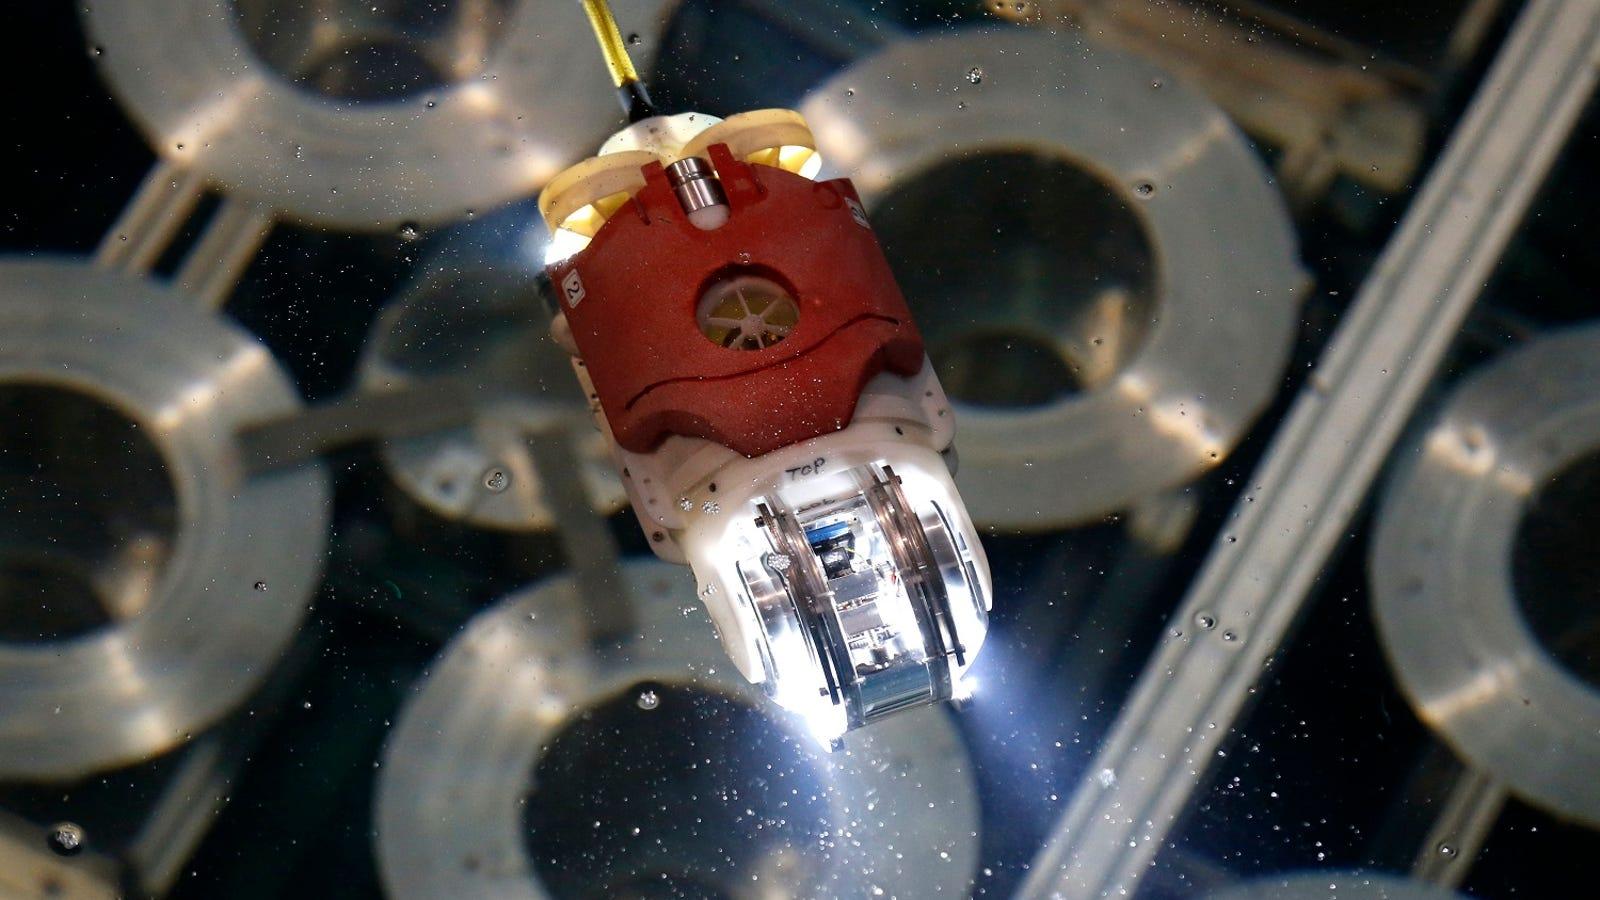 Un robot con forma de pez buscará material radiactivo en los reactores nucleares destruidos de Fukushima